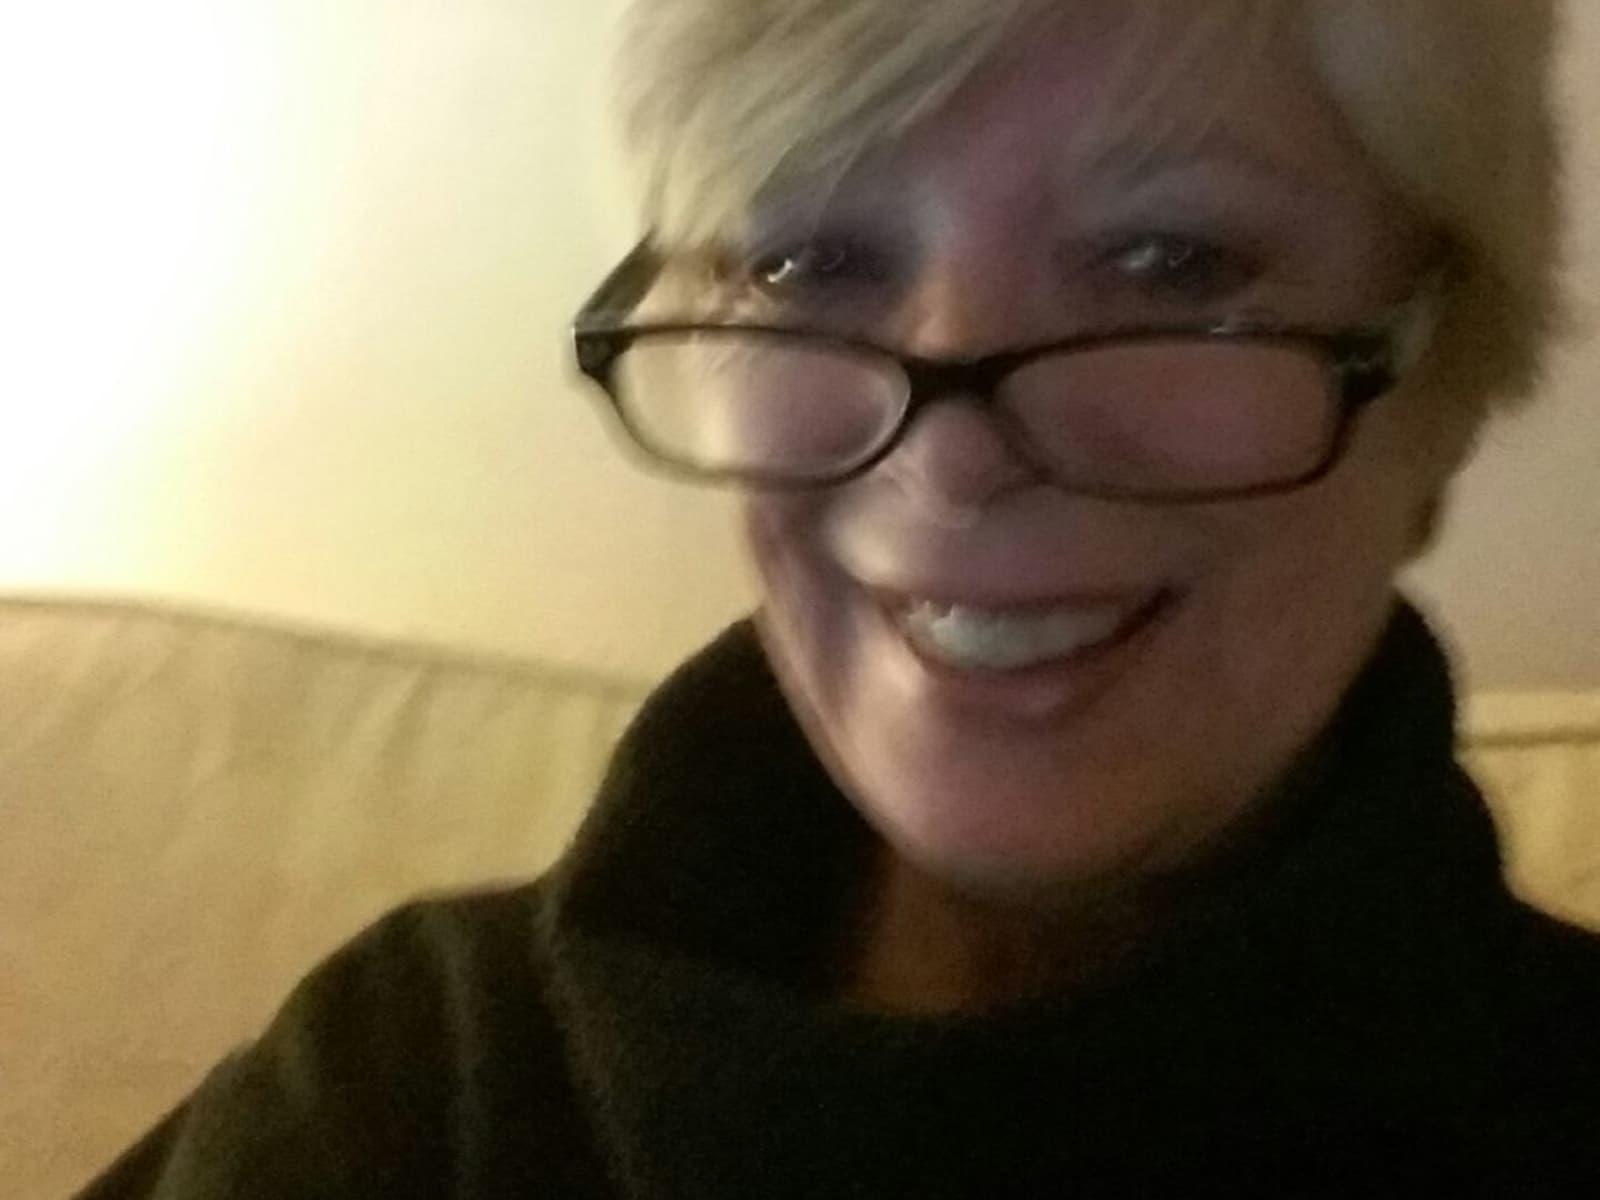 Gillian from Newcastle upon Tyne, United Kingdom